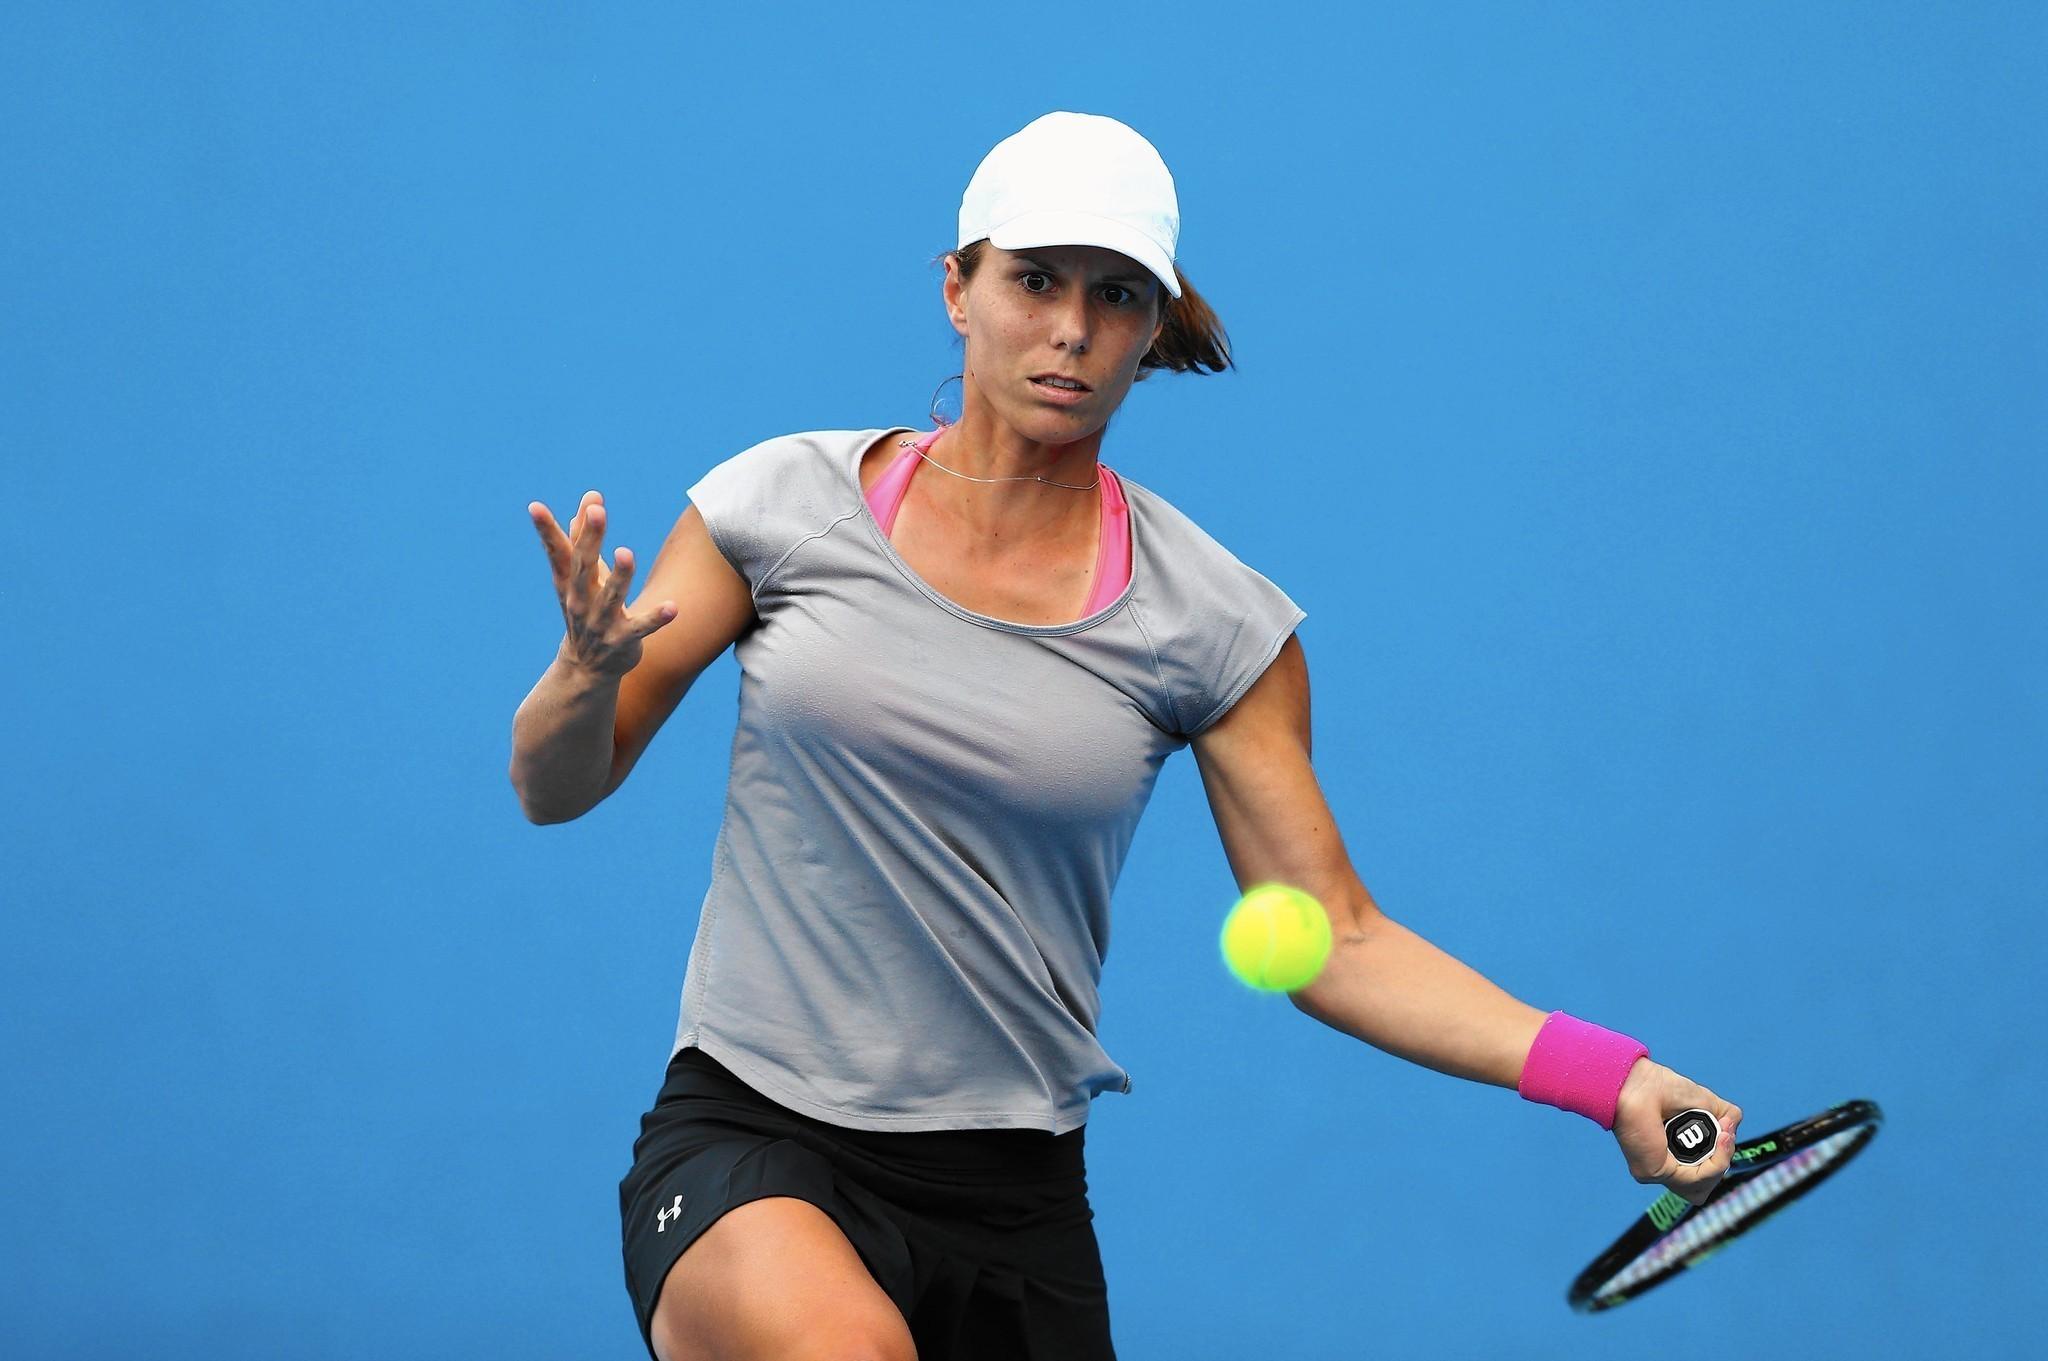 Tennis Varvara Lepchenko advances in Australian OpenVarvara Lepchenko